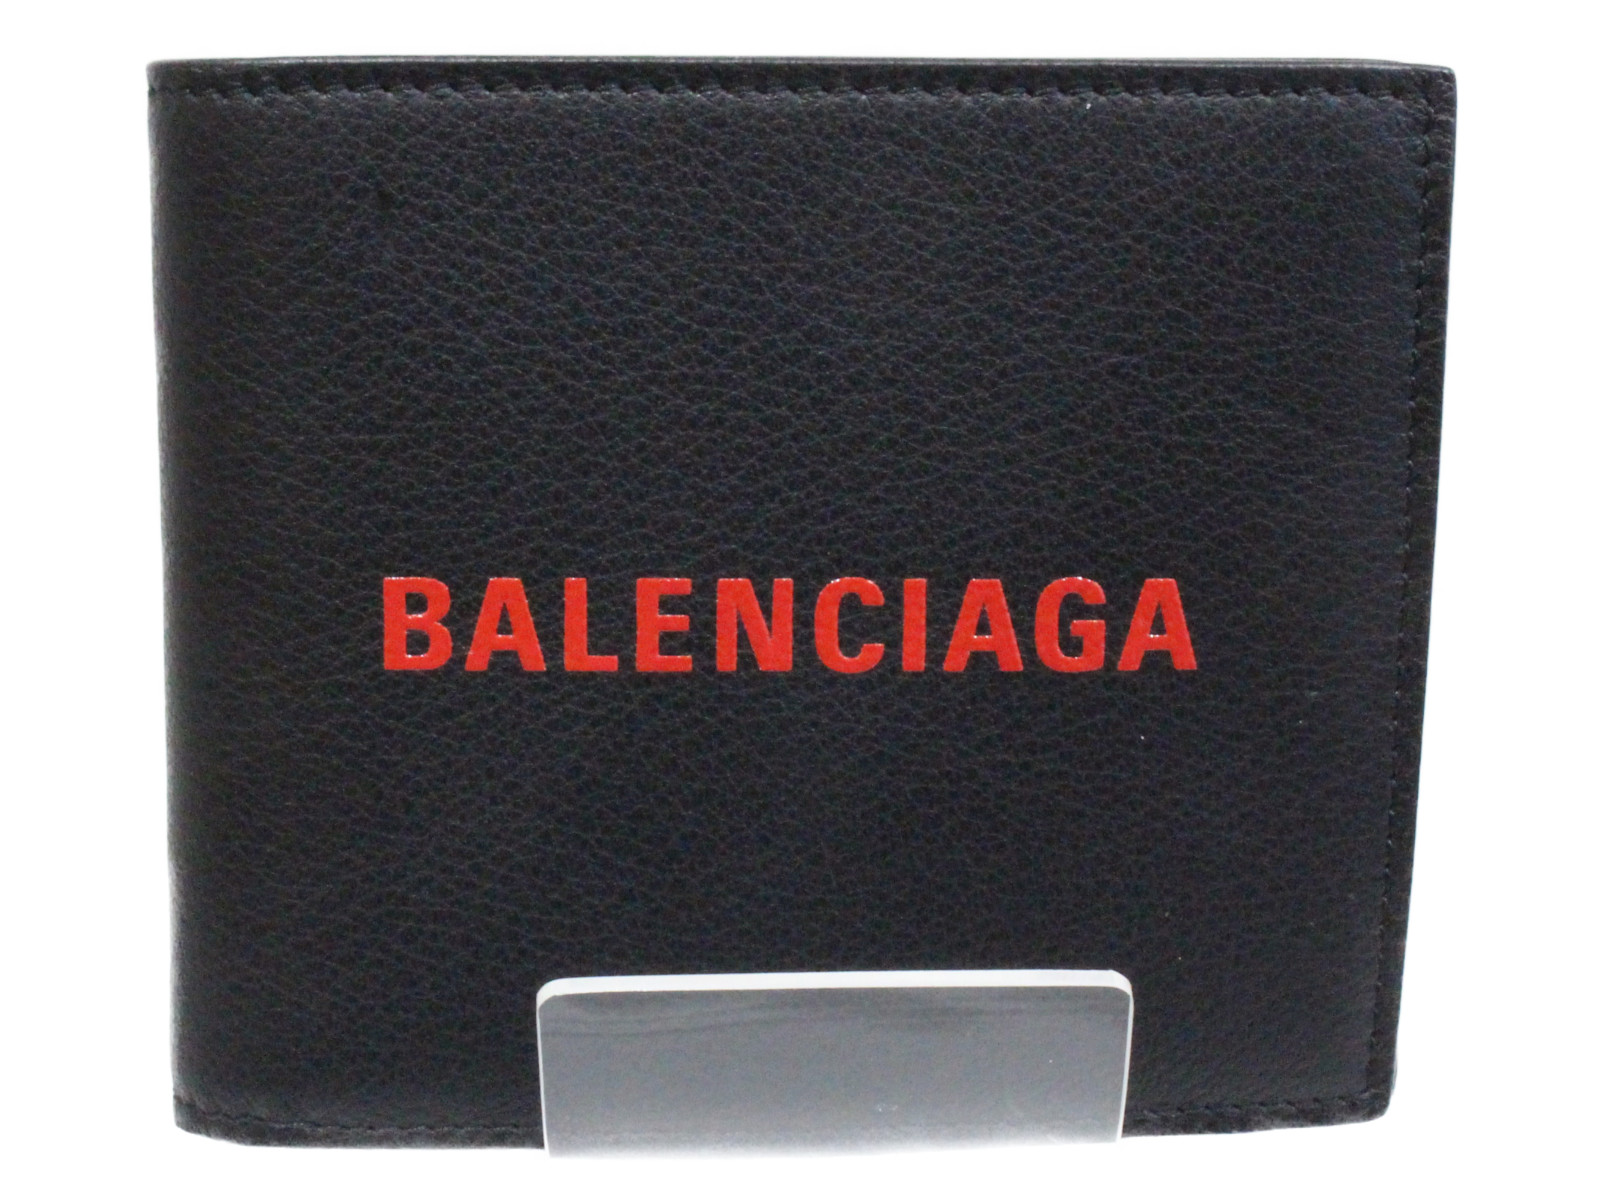 BALENCIAGA(バレンシアガ)エブリデイ 487435DLQHN1064ブラック×レッド【中古】